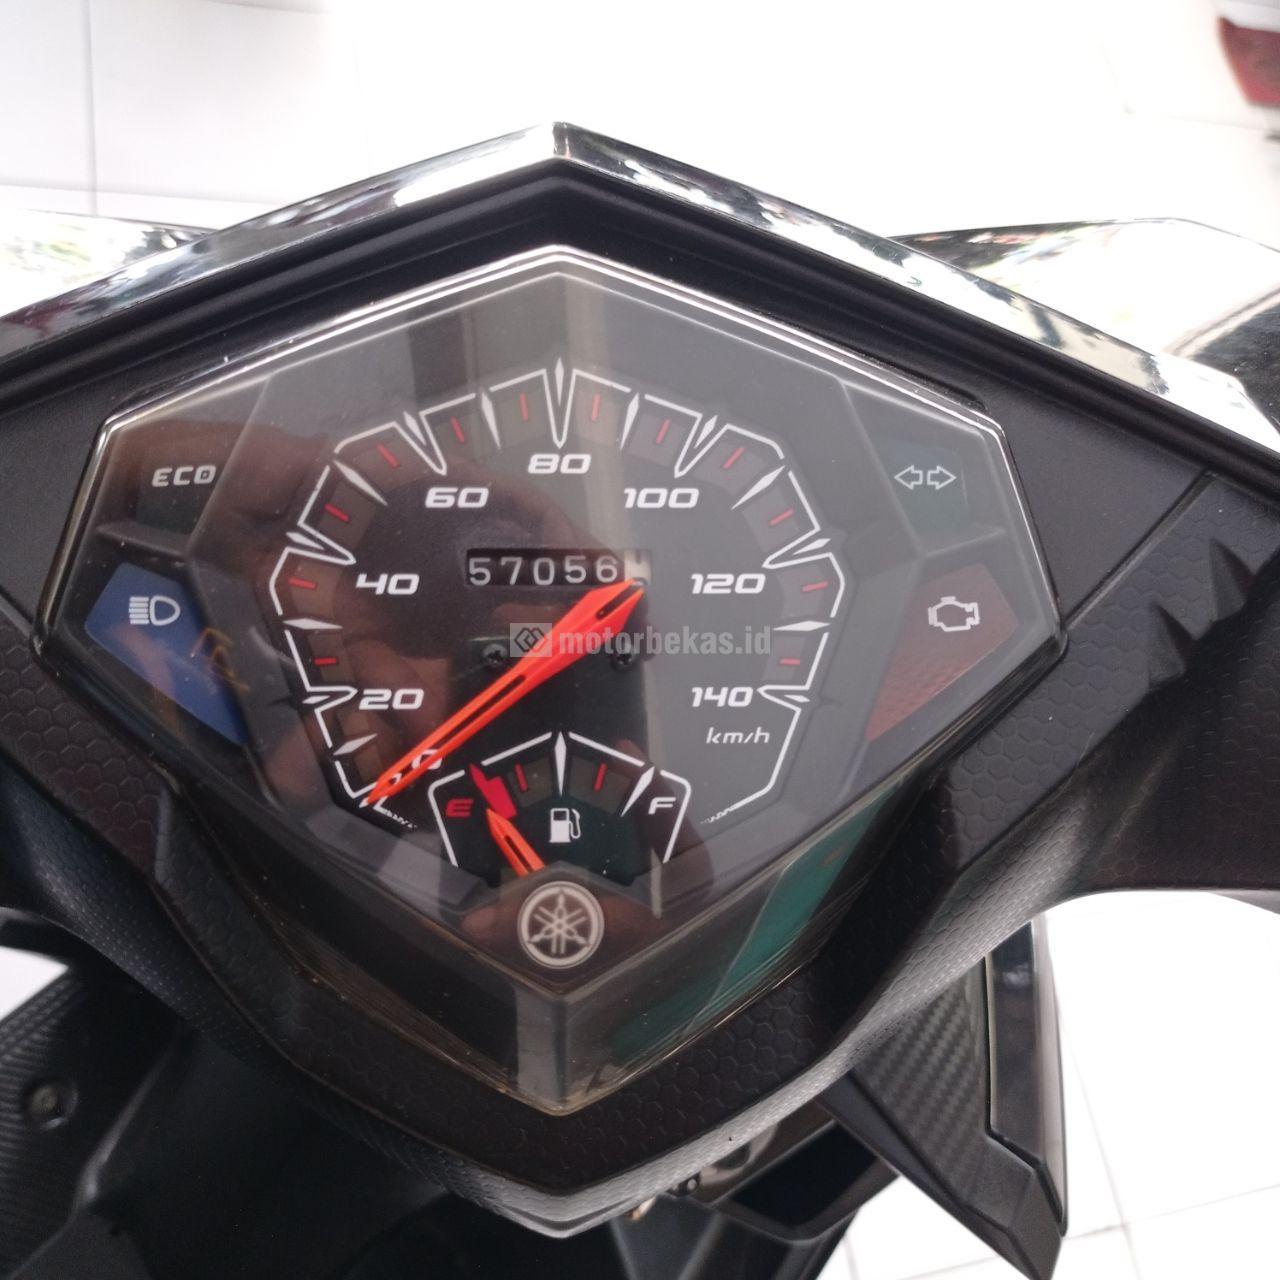 YAMAHA MIO M3 125  448 motorbekas.id